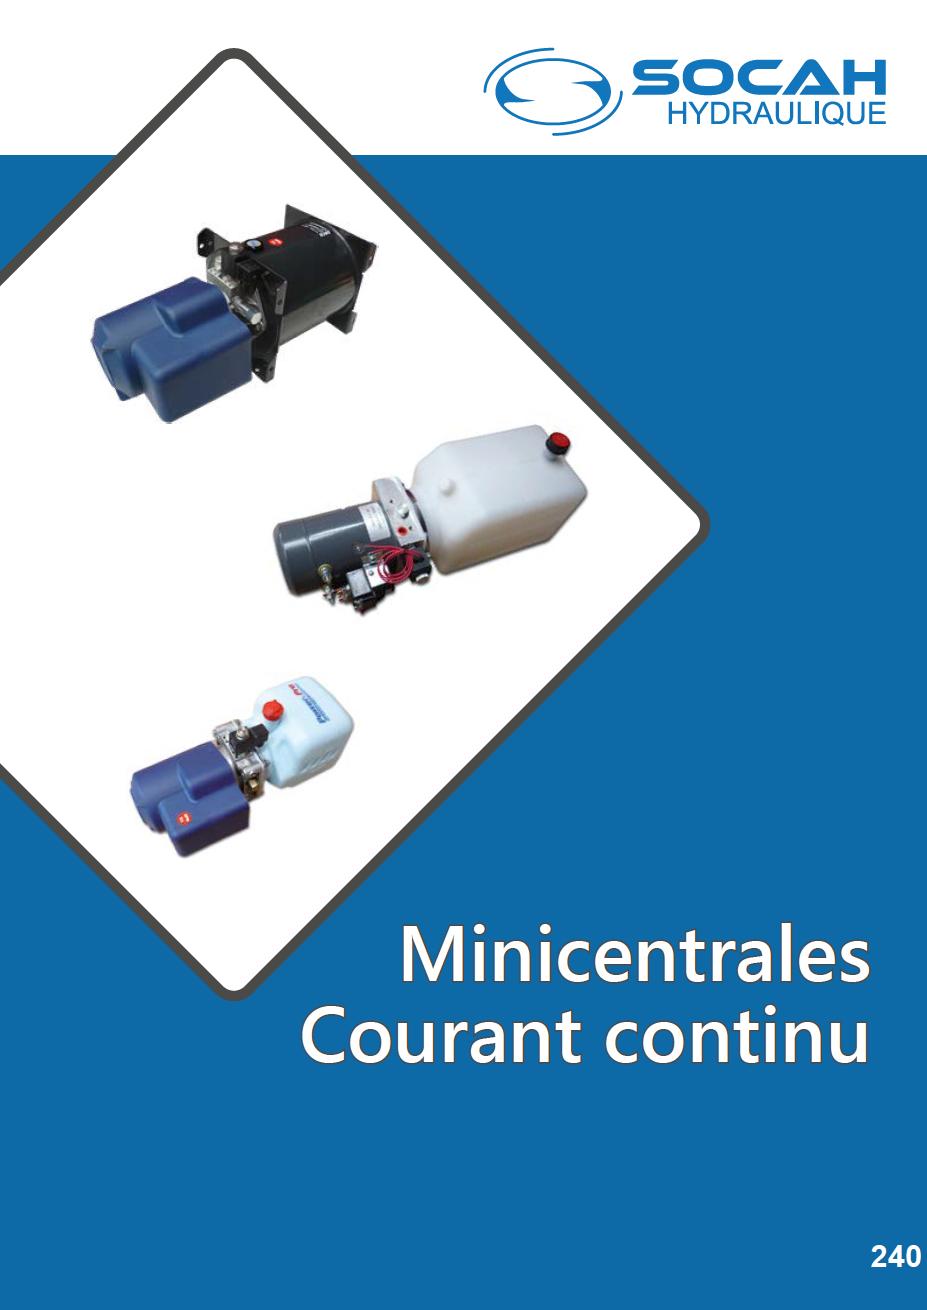 Fiche technique minicentrales courant continu